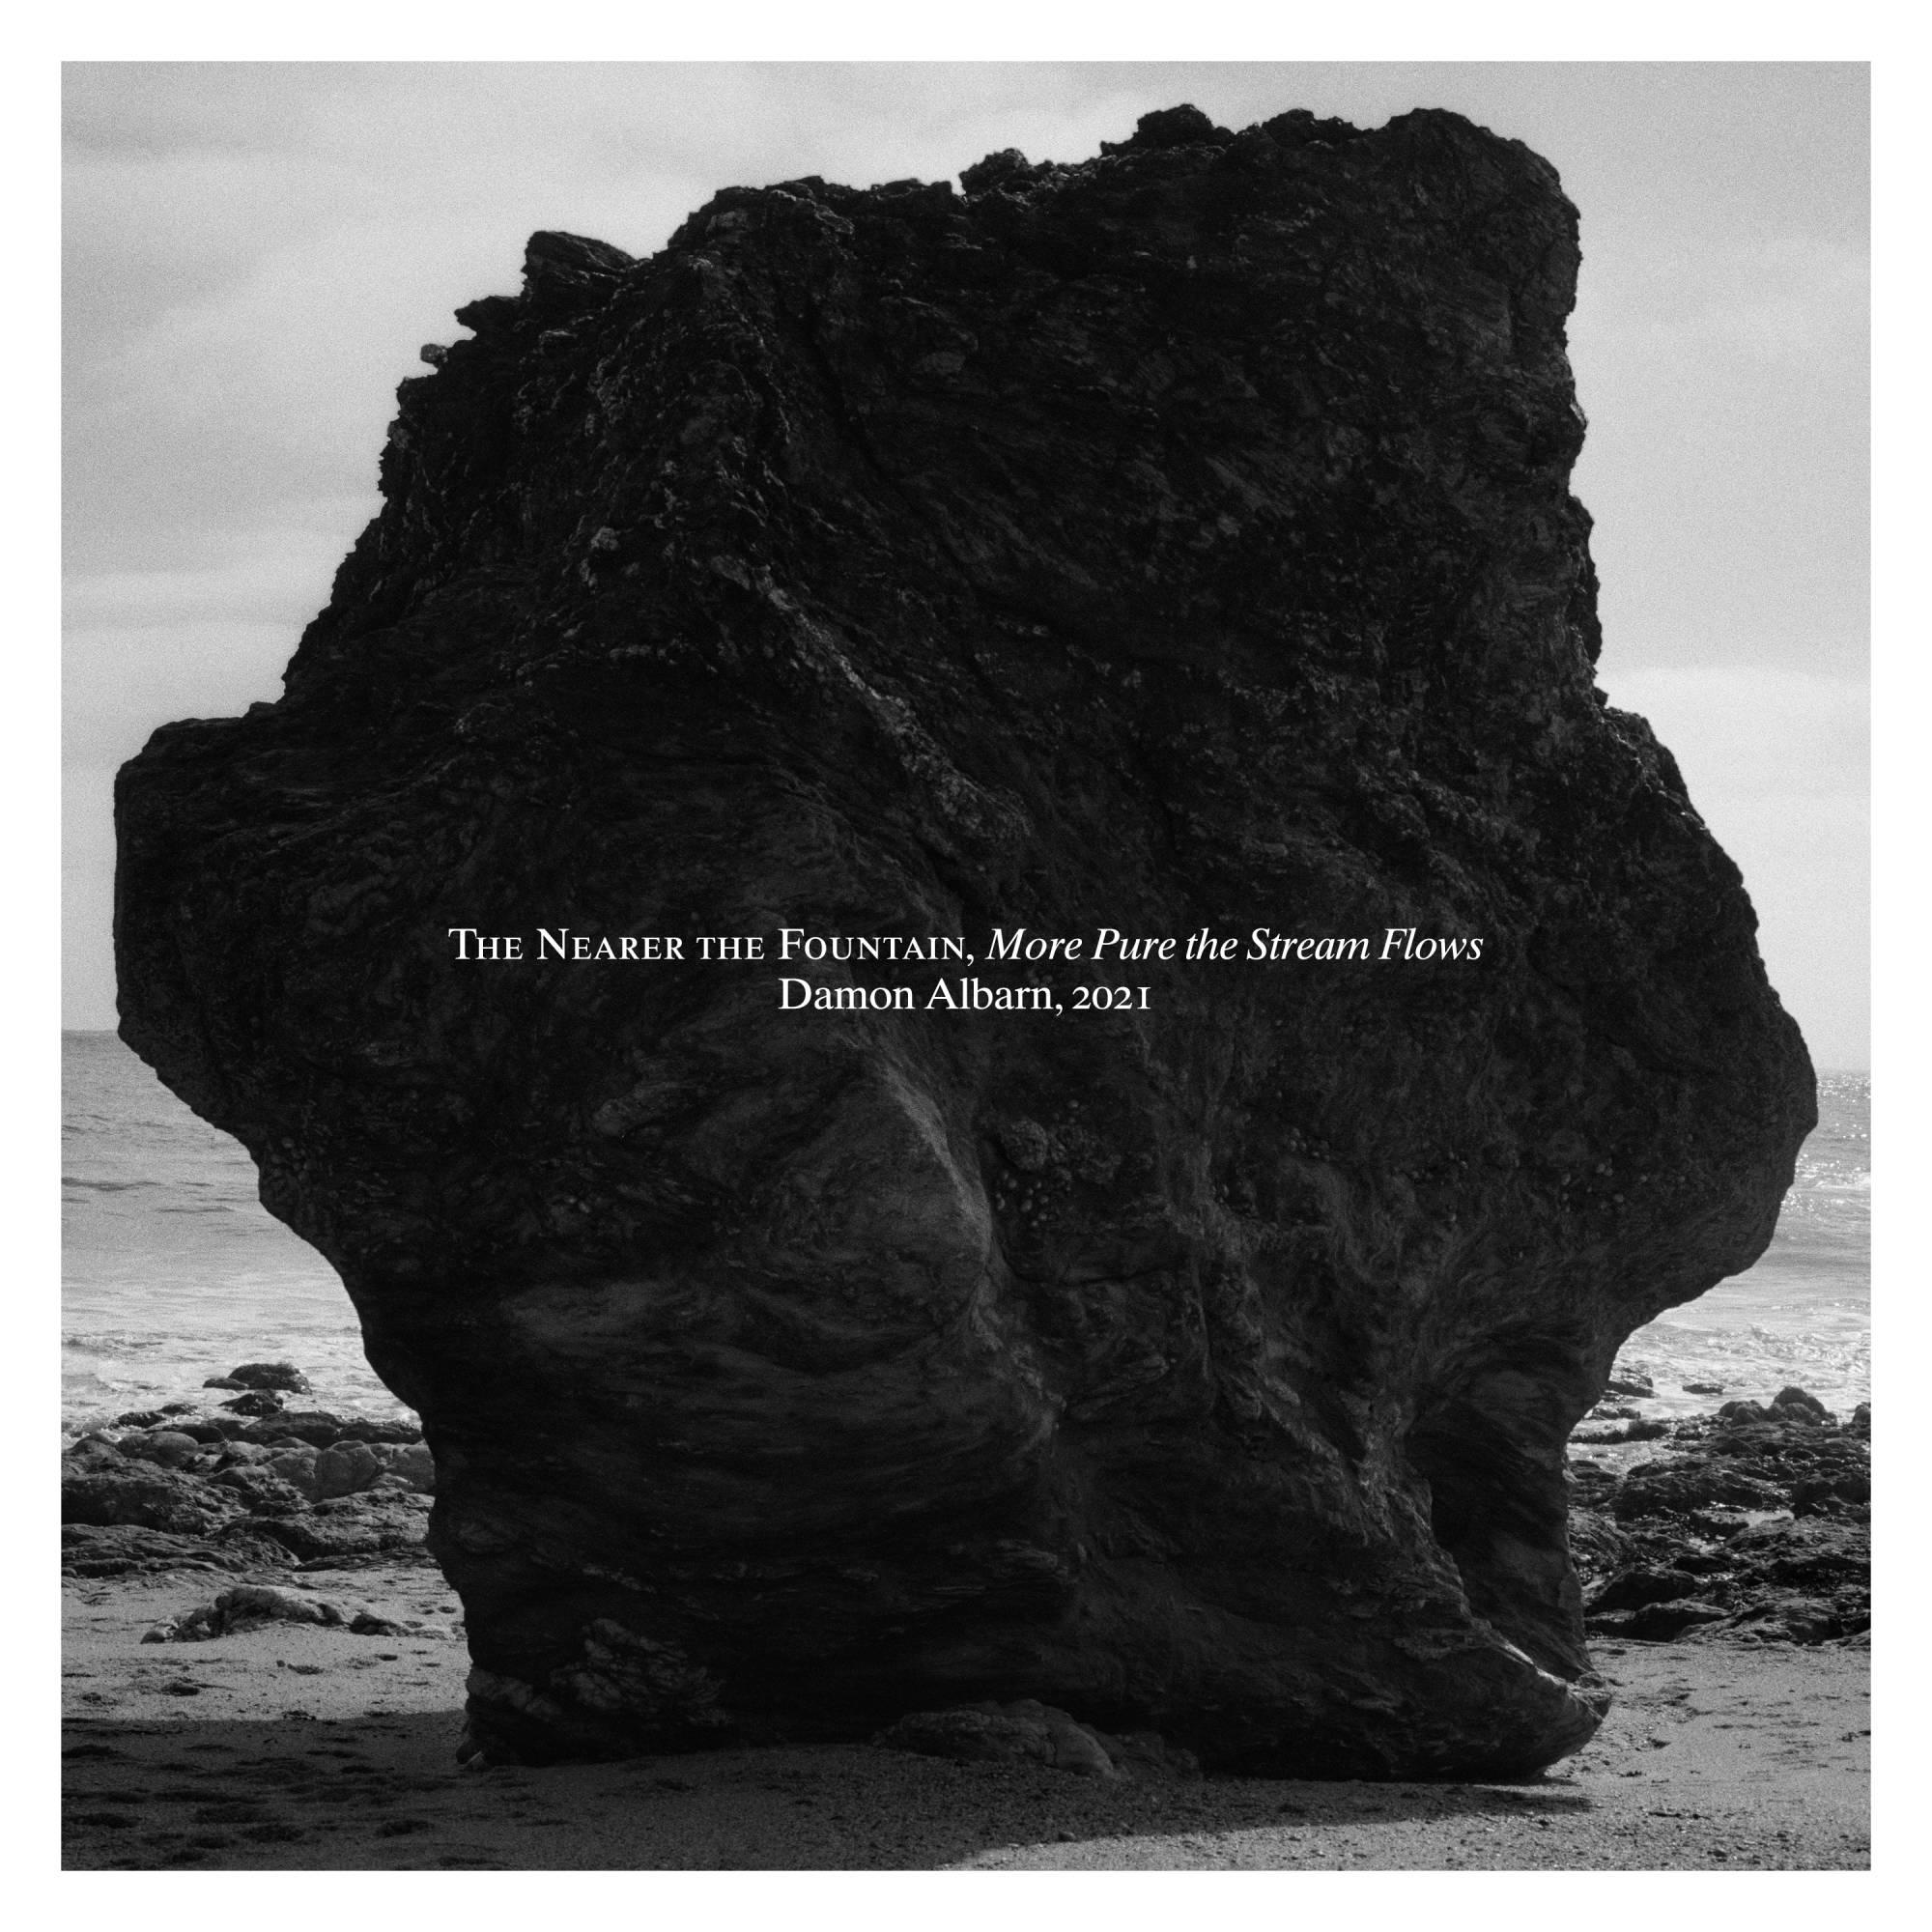 Damon Albarn returns with new solo album 'The Nearer The Fountain, More Pure The Stream Flows'.